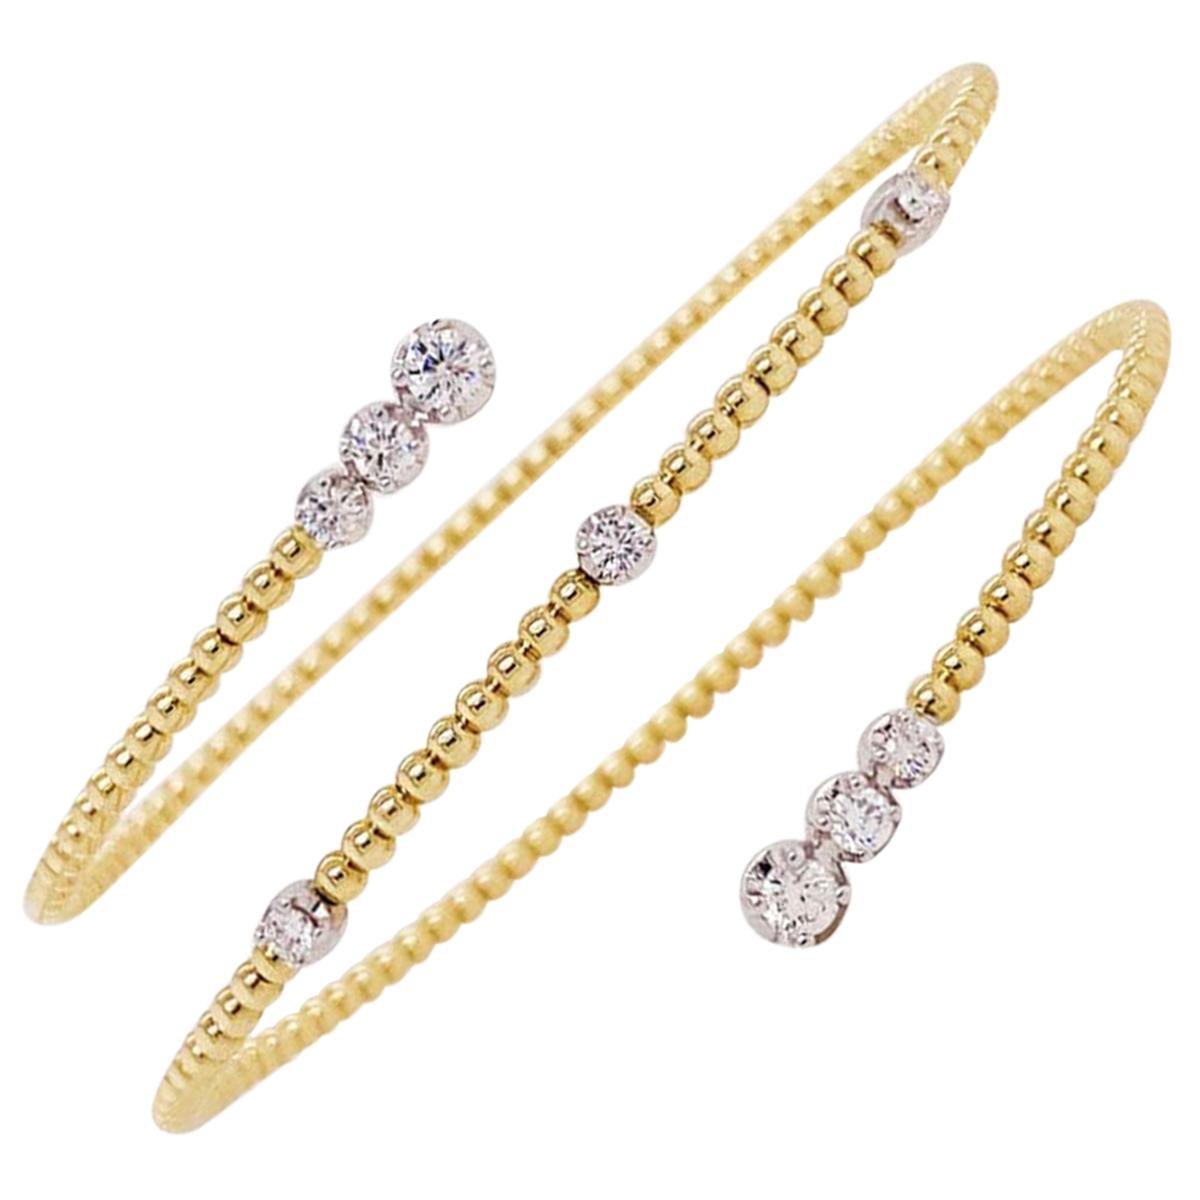 Diamond Bracelet Flexible Fashion Bracelet 14K Yellow Gold Half Carat Diamond